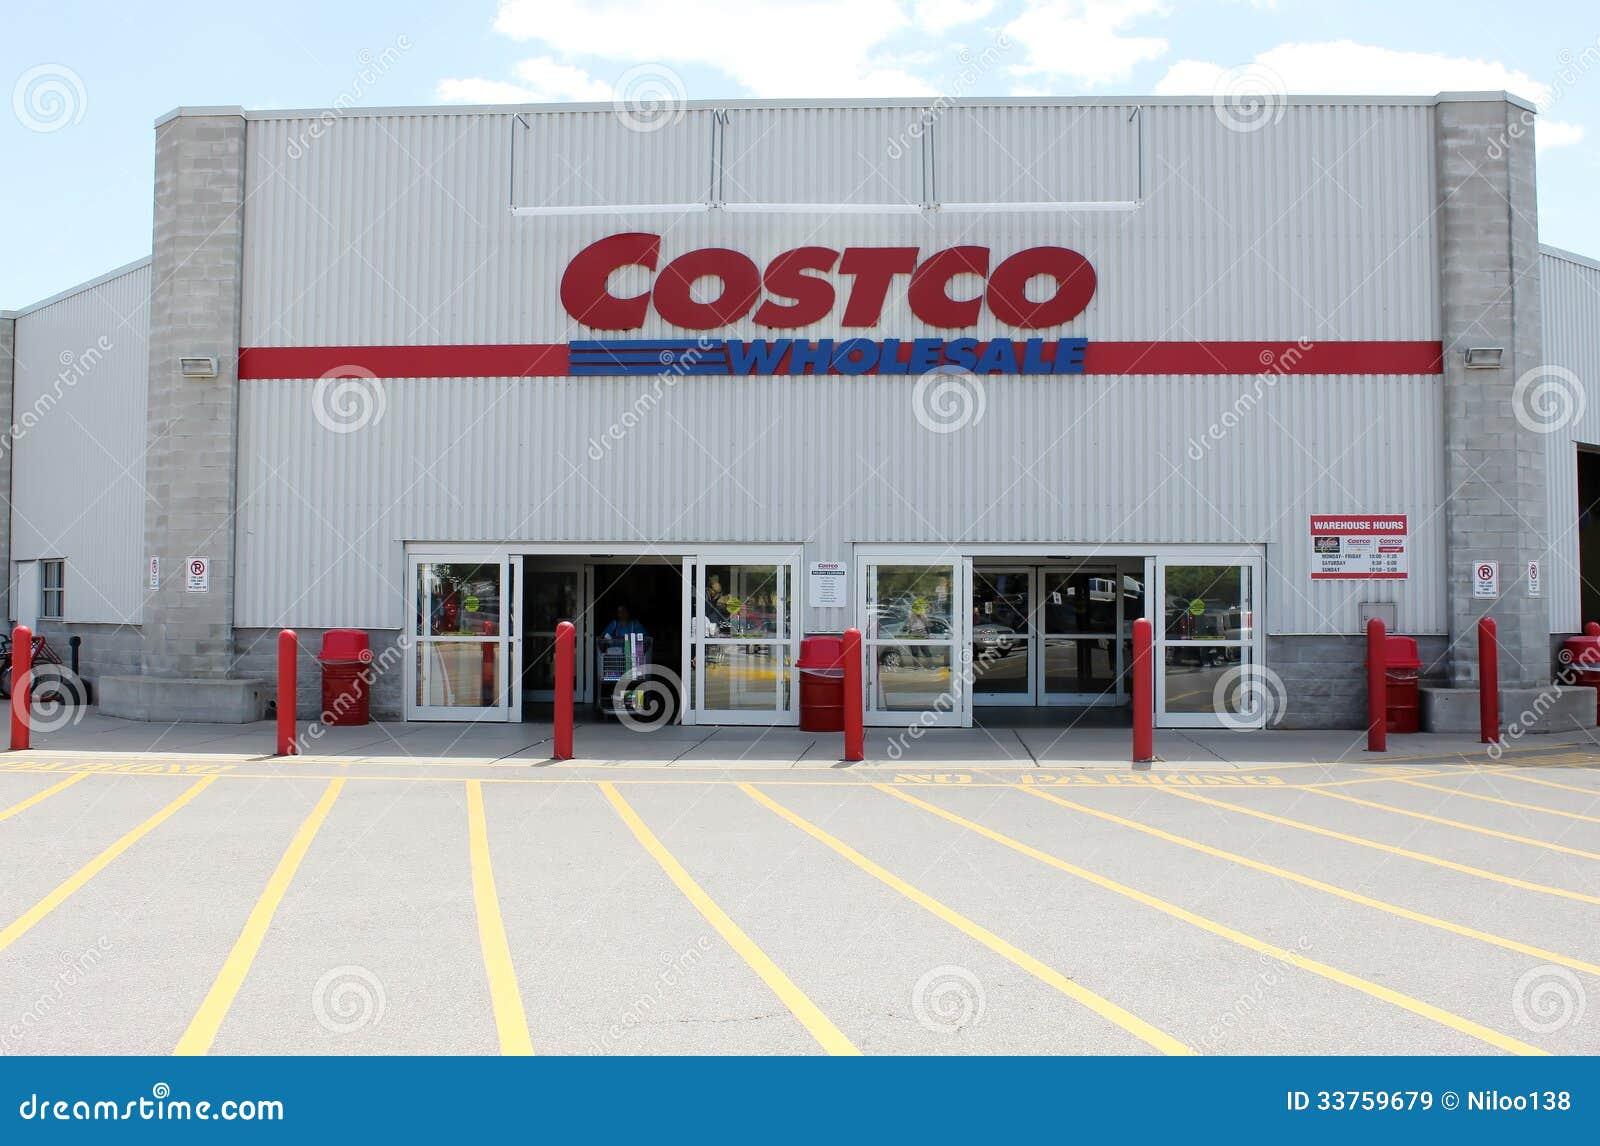 Stunning Costco Resumen Images - Entry Level Resume Templates ...